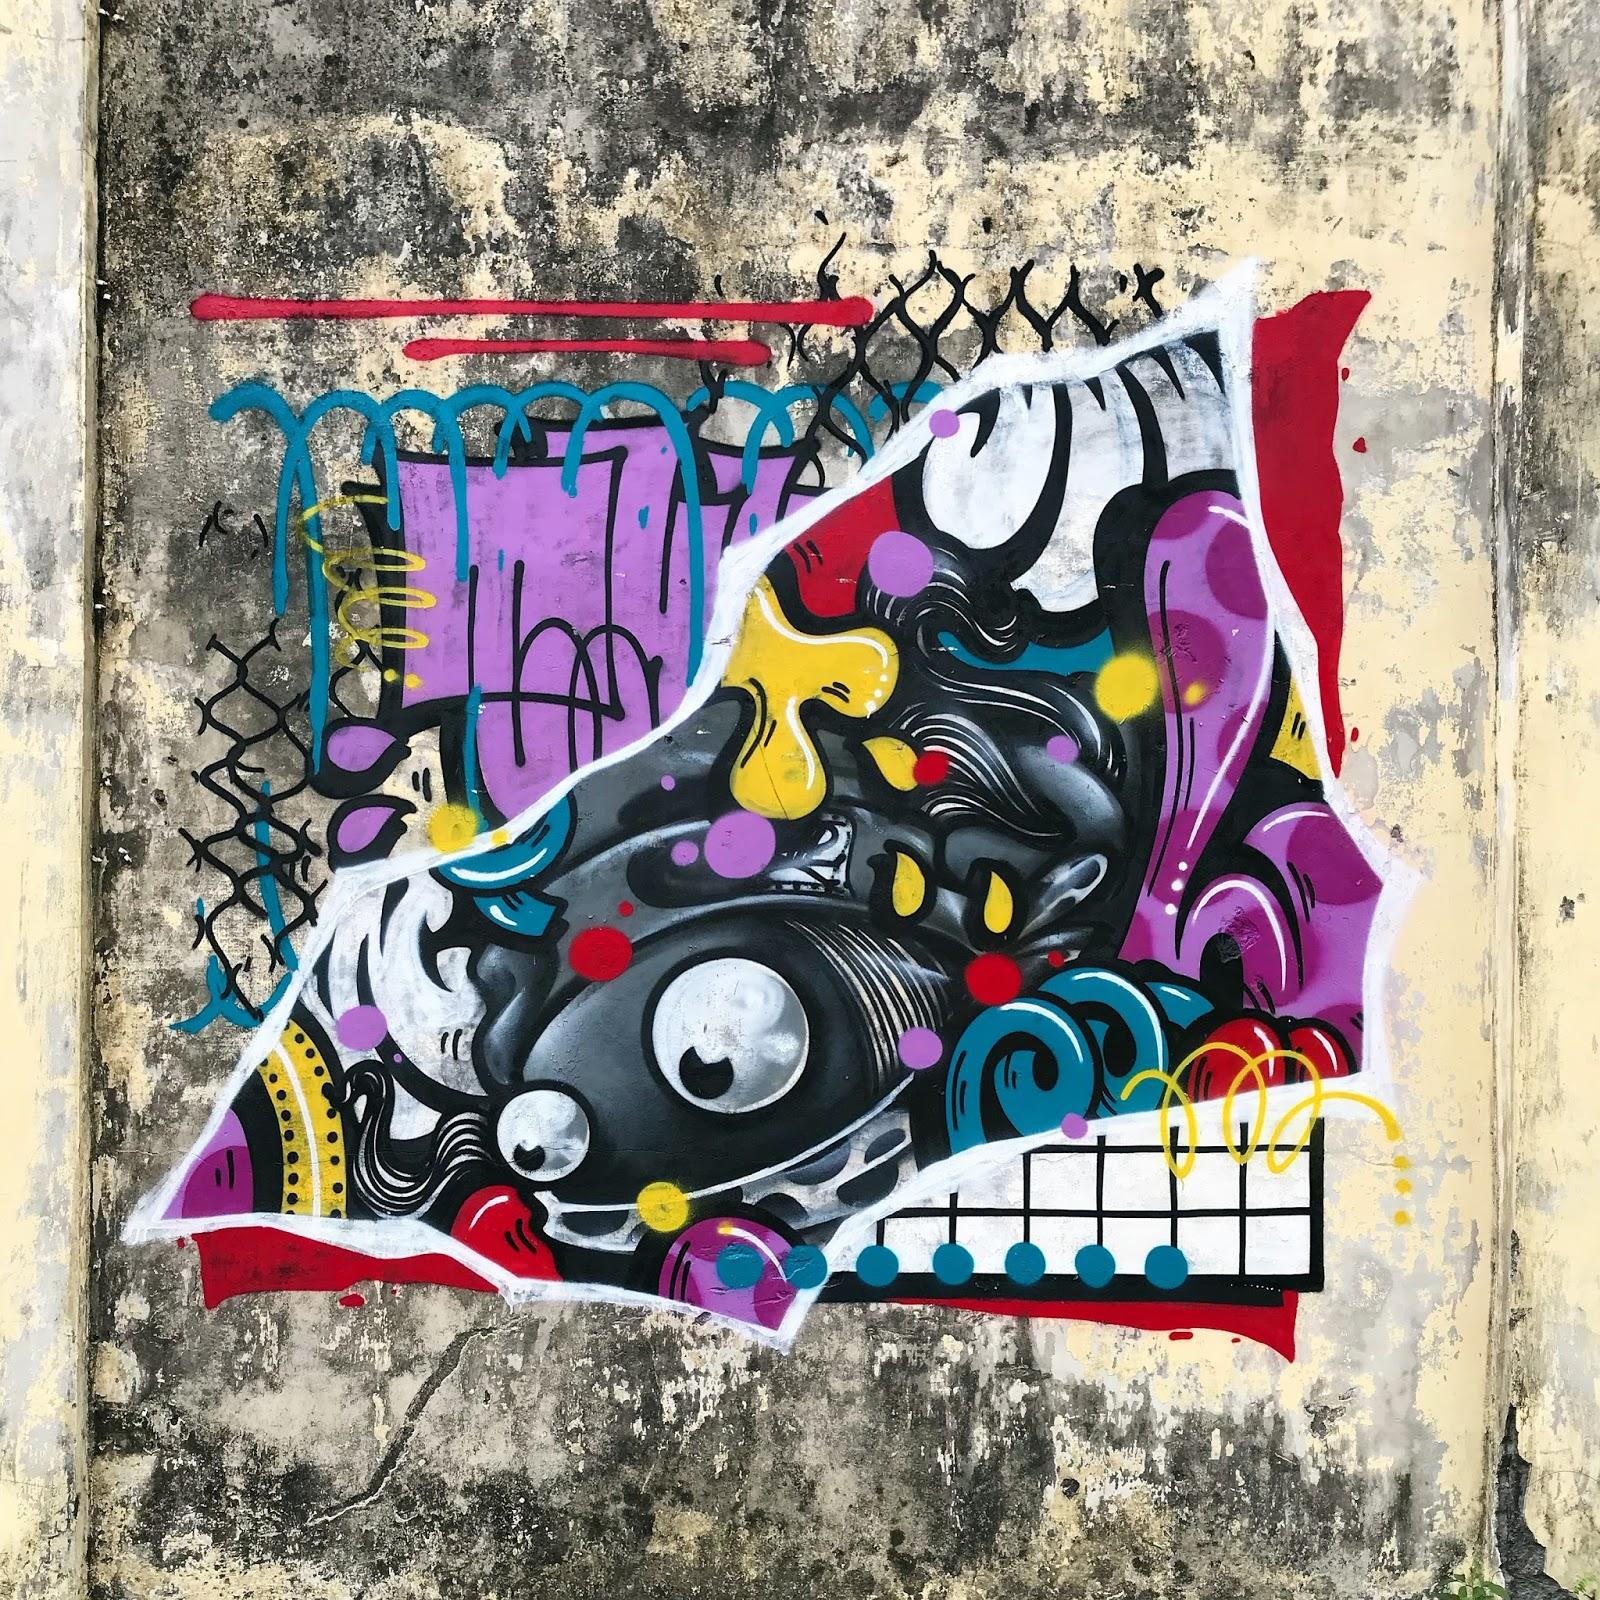 Street art graffiti tuyuloveme